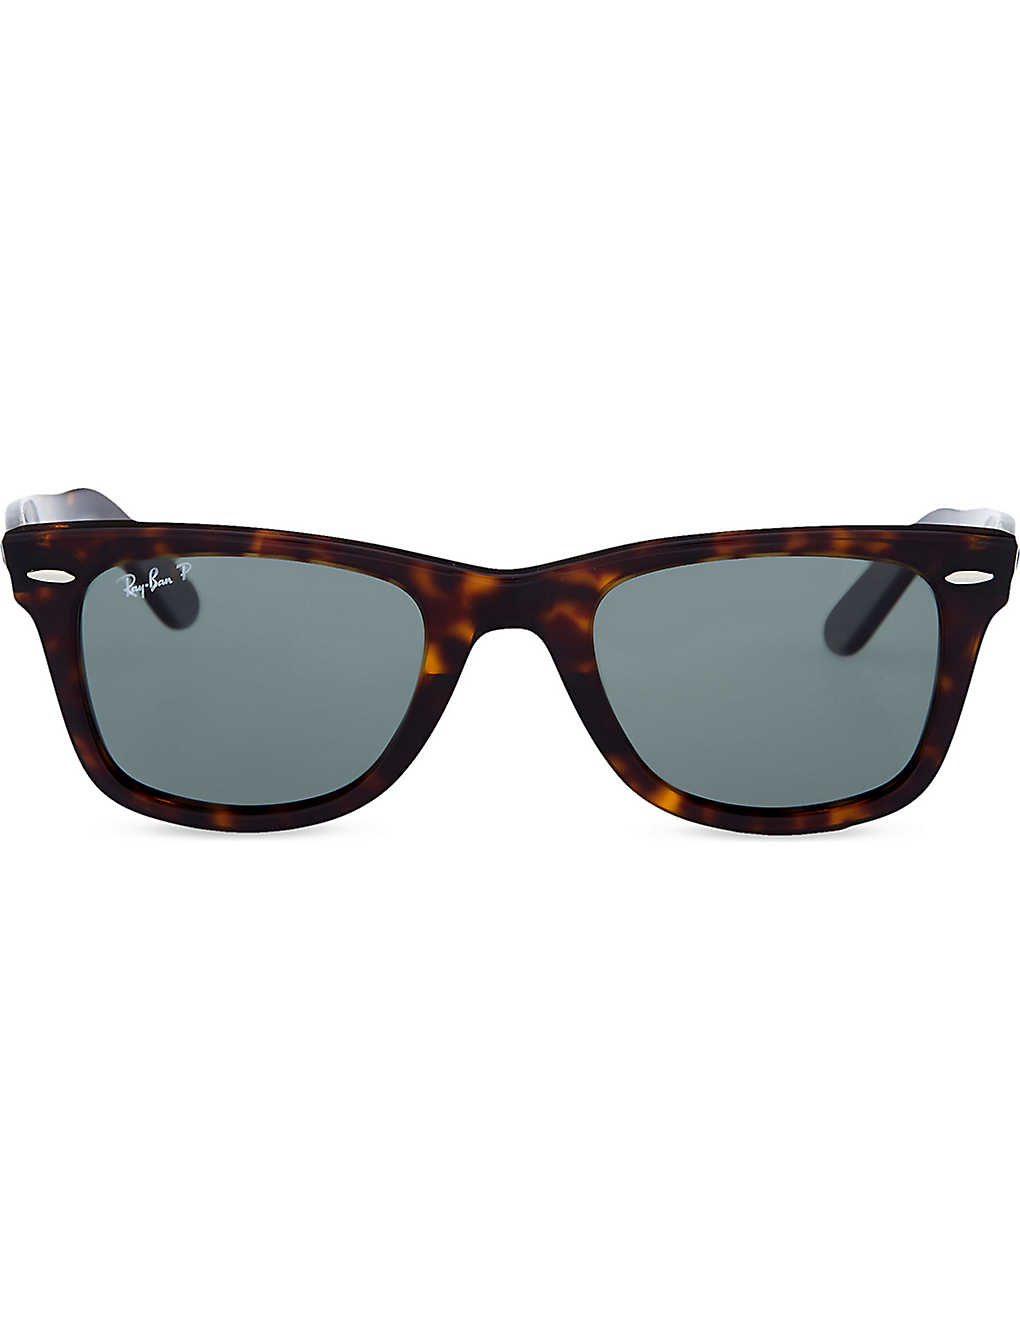 e34a3659c6 RAY-BAN - Unisex tortoise effect wayfarer sunglasses